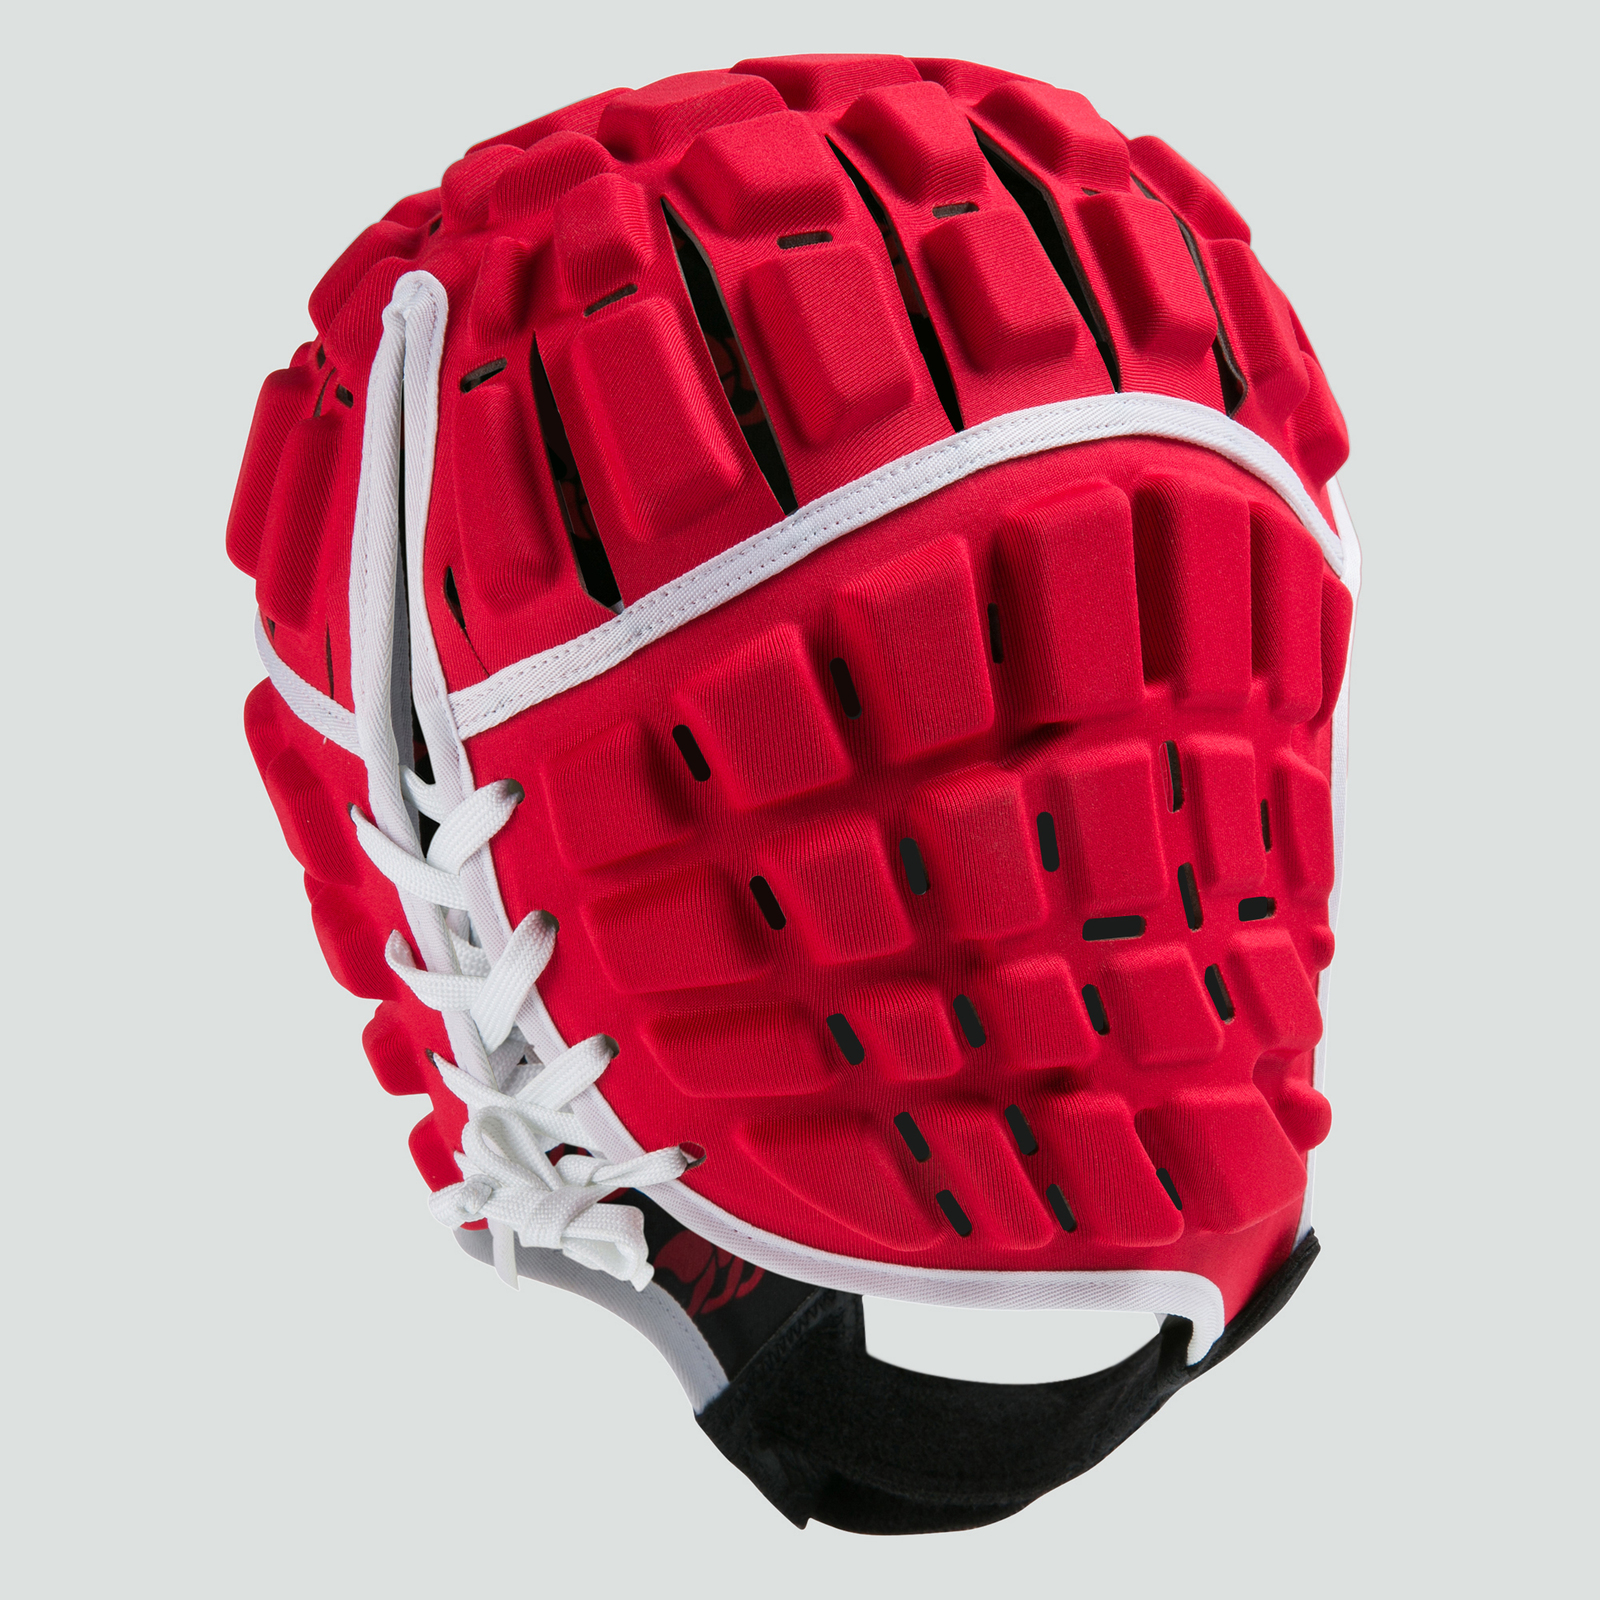 Reinforcer Headguard Adults- Medium (Red) image